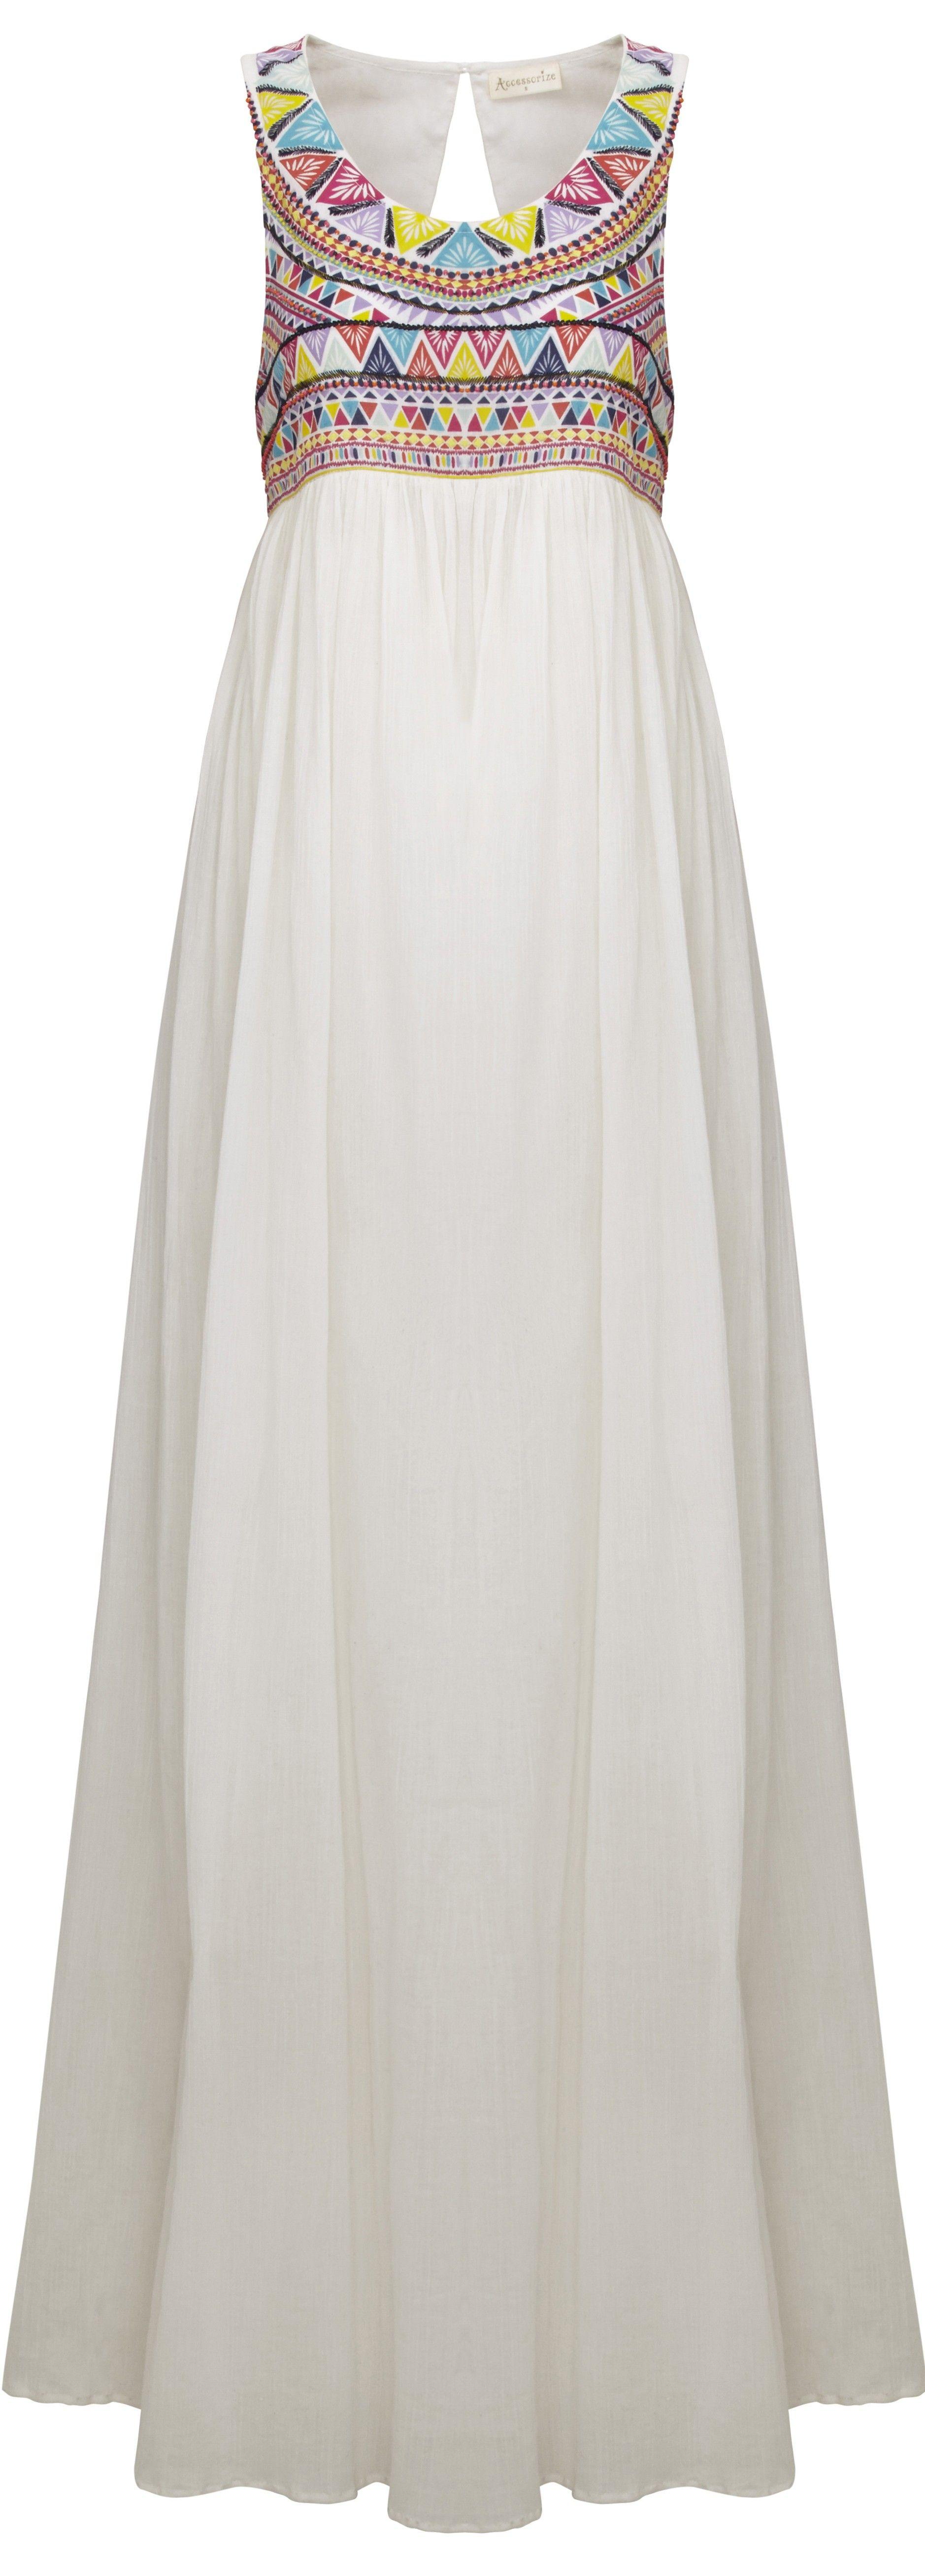 Alternative wedding dresses so cute white dresses article